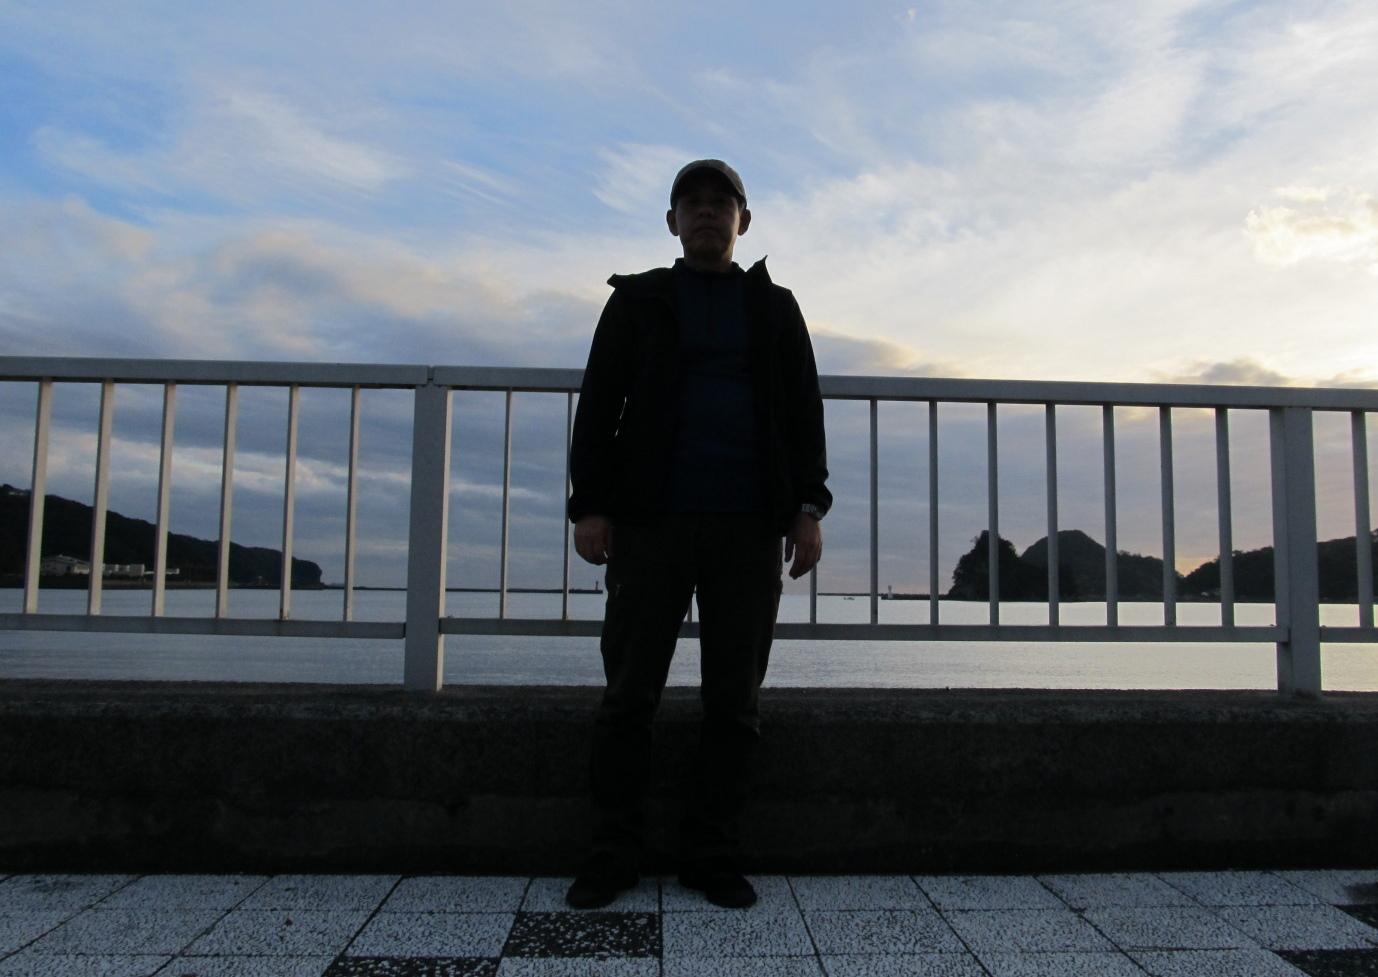 hirokami1024